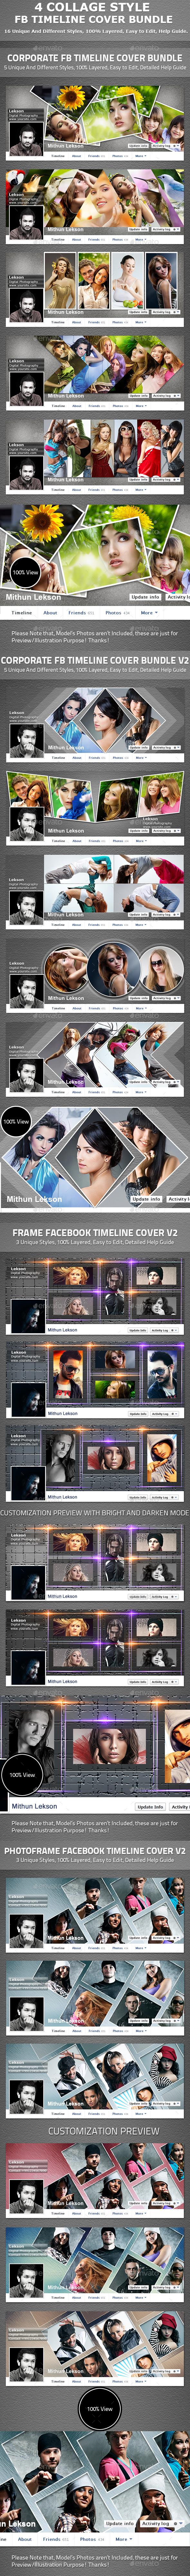 4 Collage Style Fb Timeline Cover Bundle - Facebook Timeline Covers Social Media